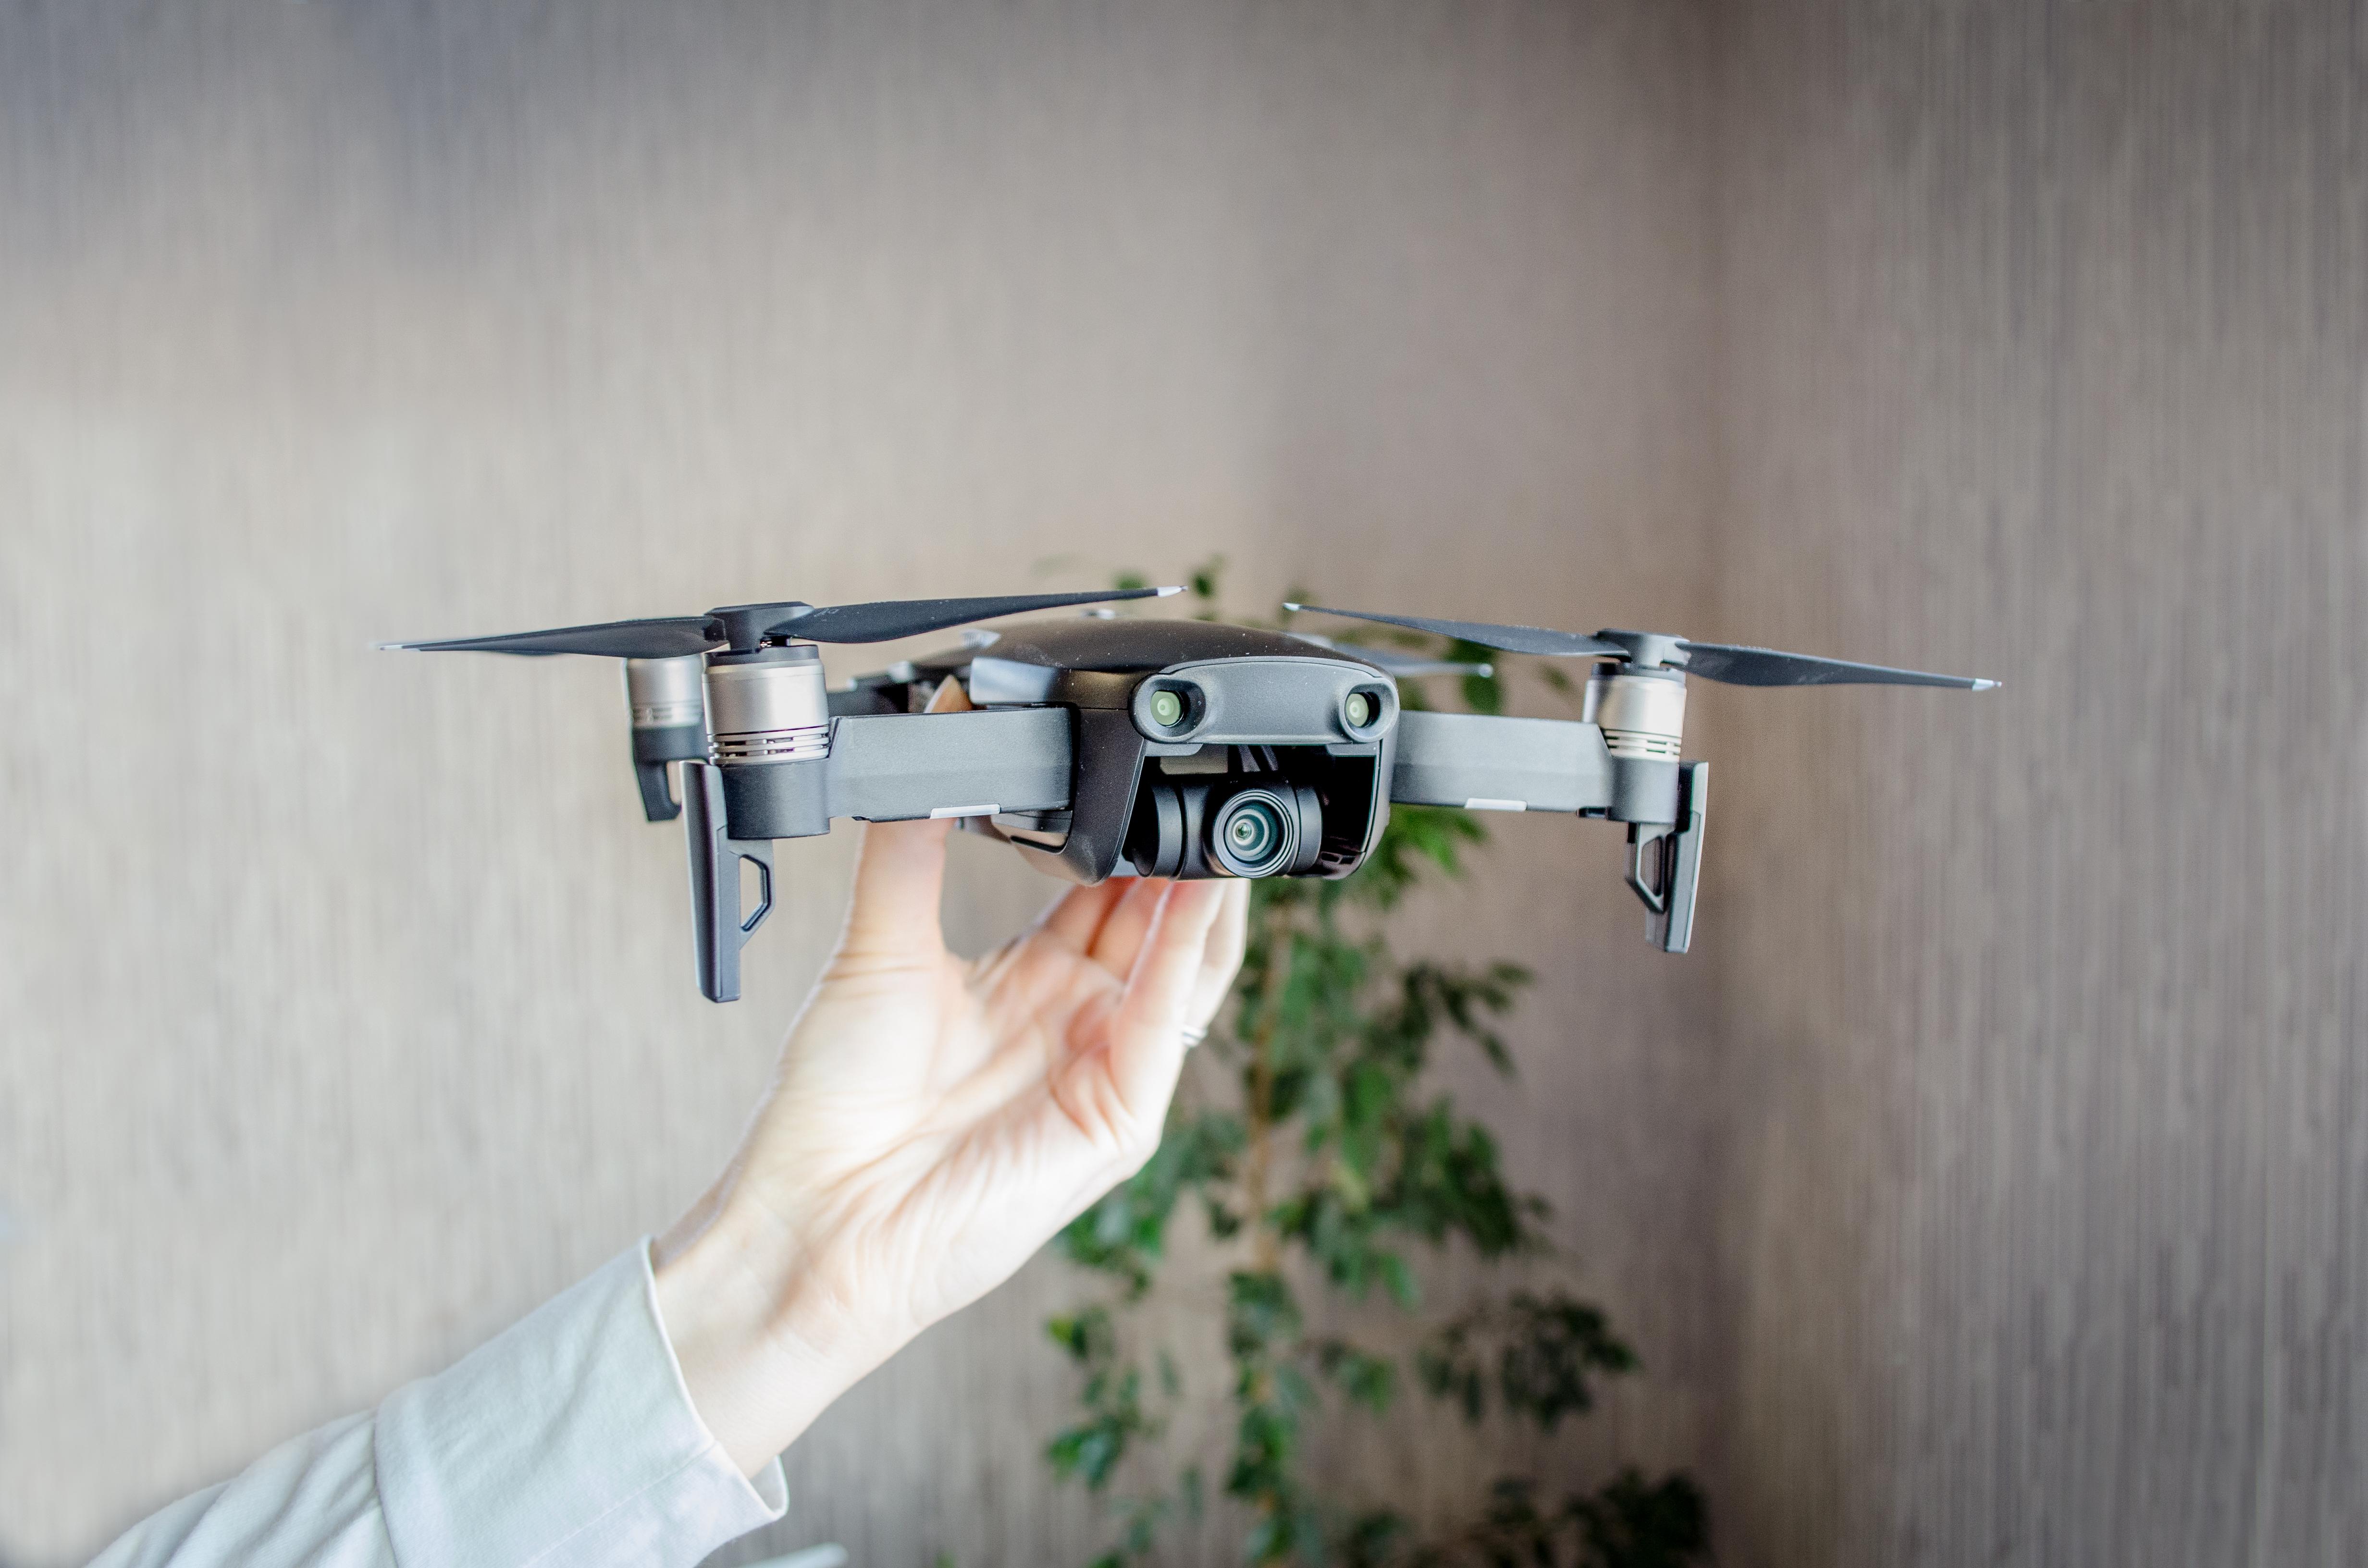 mavic air, best travel drone, mavic air travel, traveling with mavic air, best drone for traveling